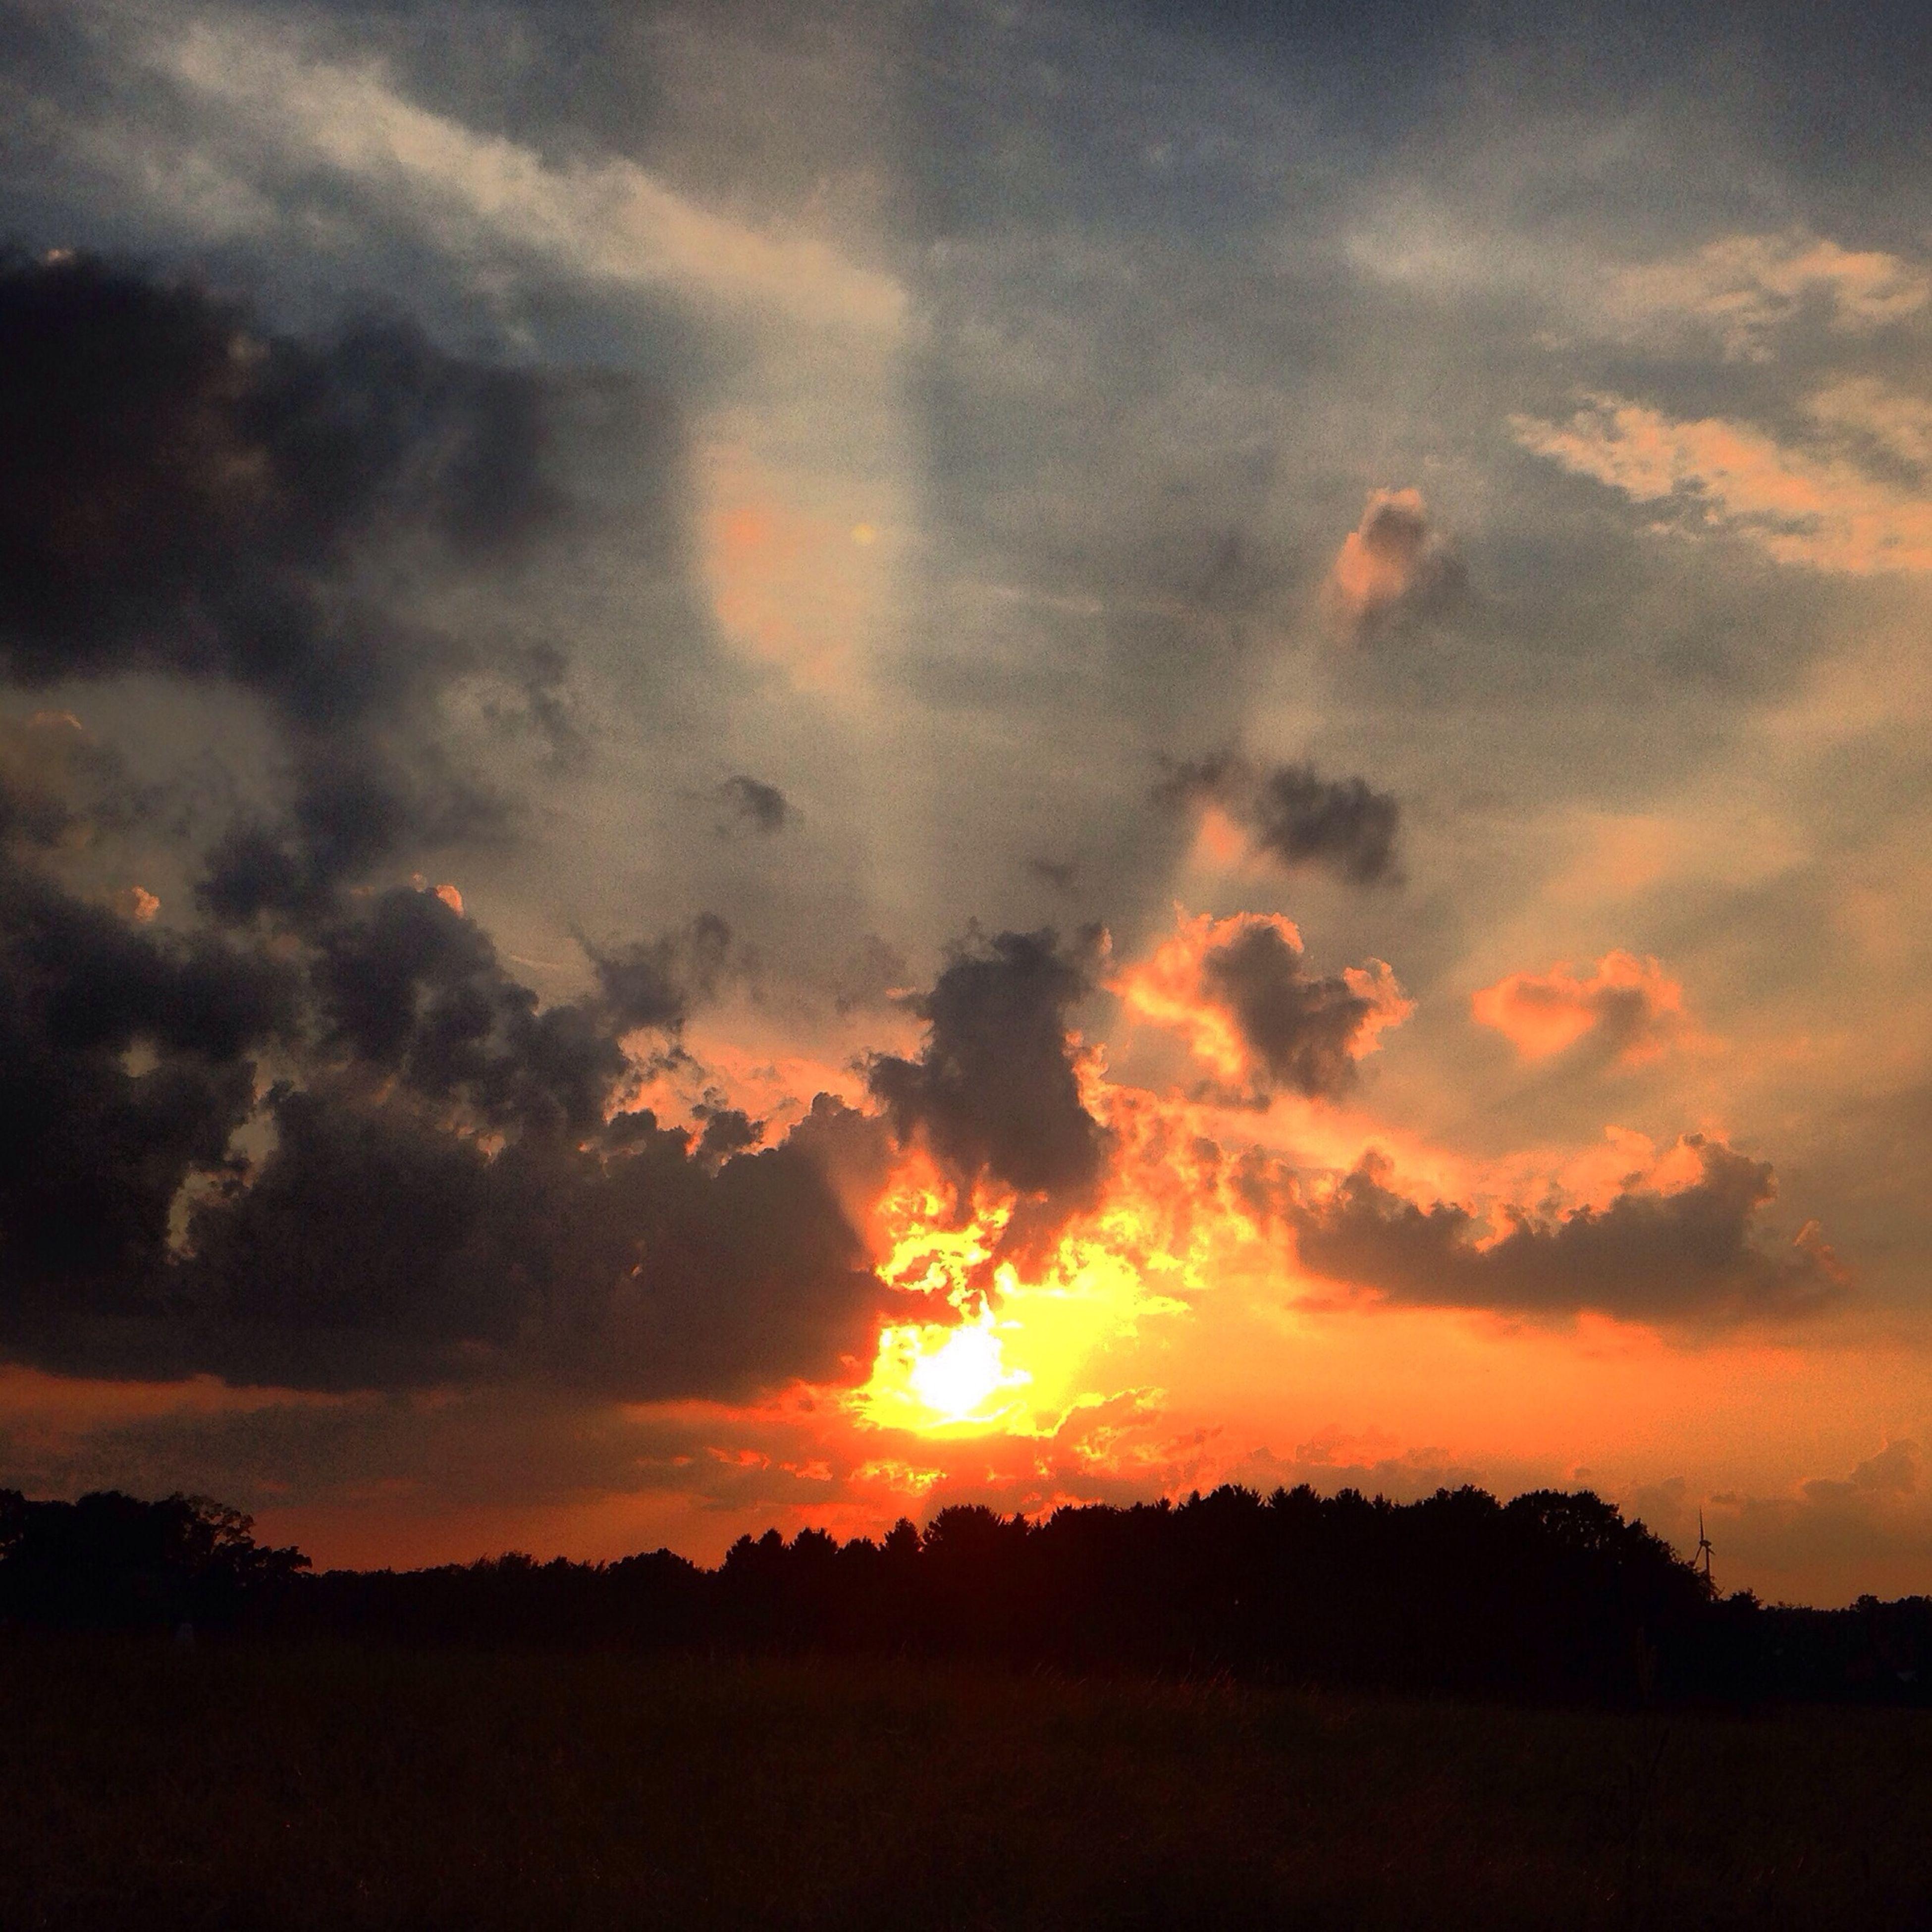 sunset, silhouette, sky, tranquil scene, scenics, beauty in nature, tranquility, landscape, cloud - sky, orange color, nature, idyllic, dramatic sky, sun, cloud, field, cloudy, outdoors, sunlight, moody sky